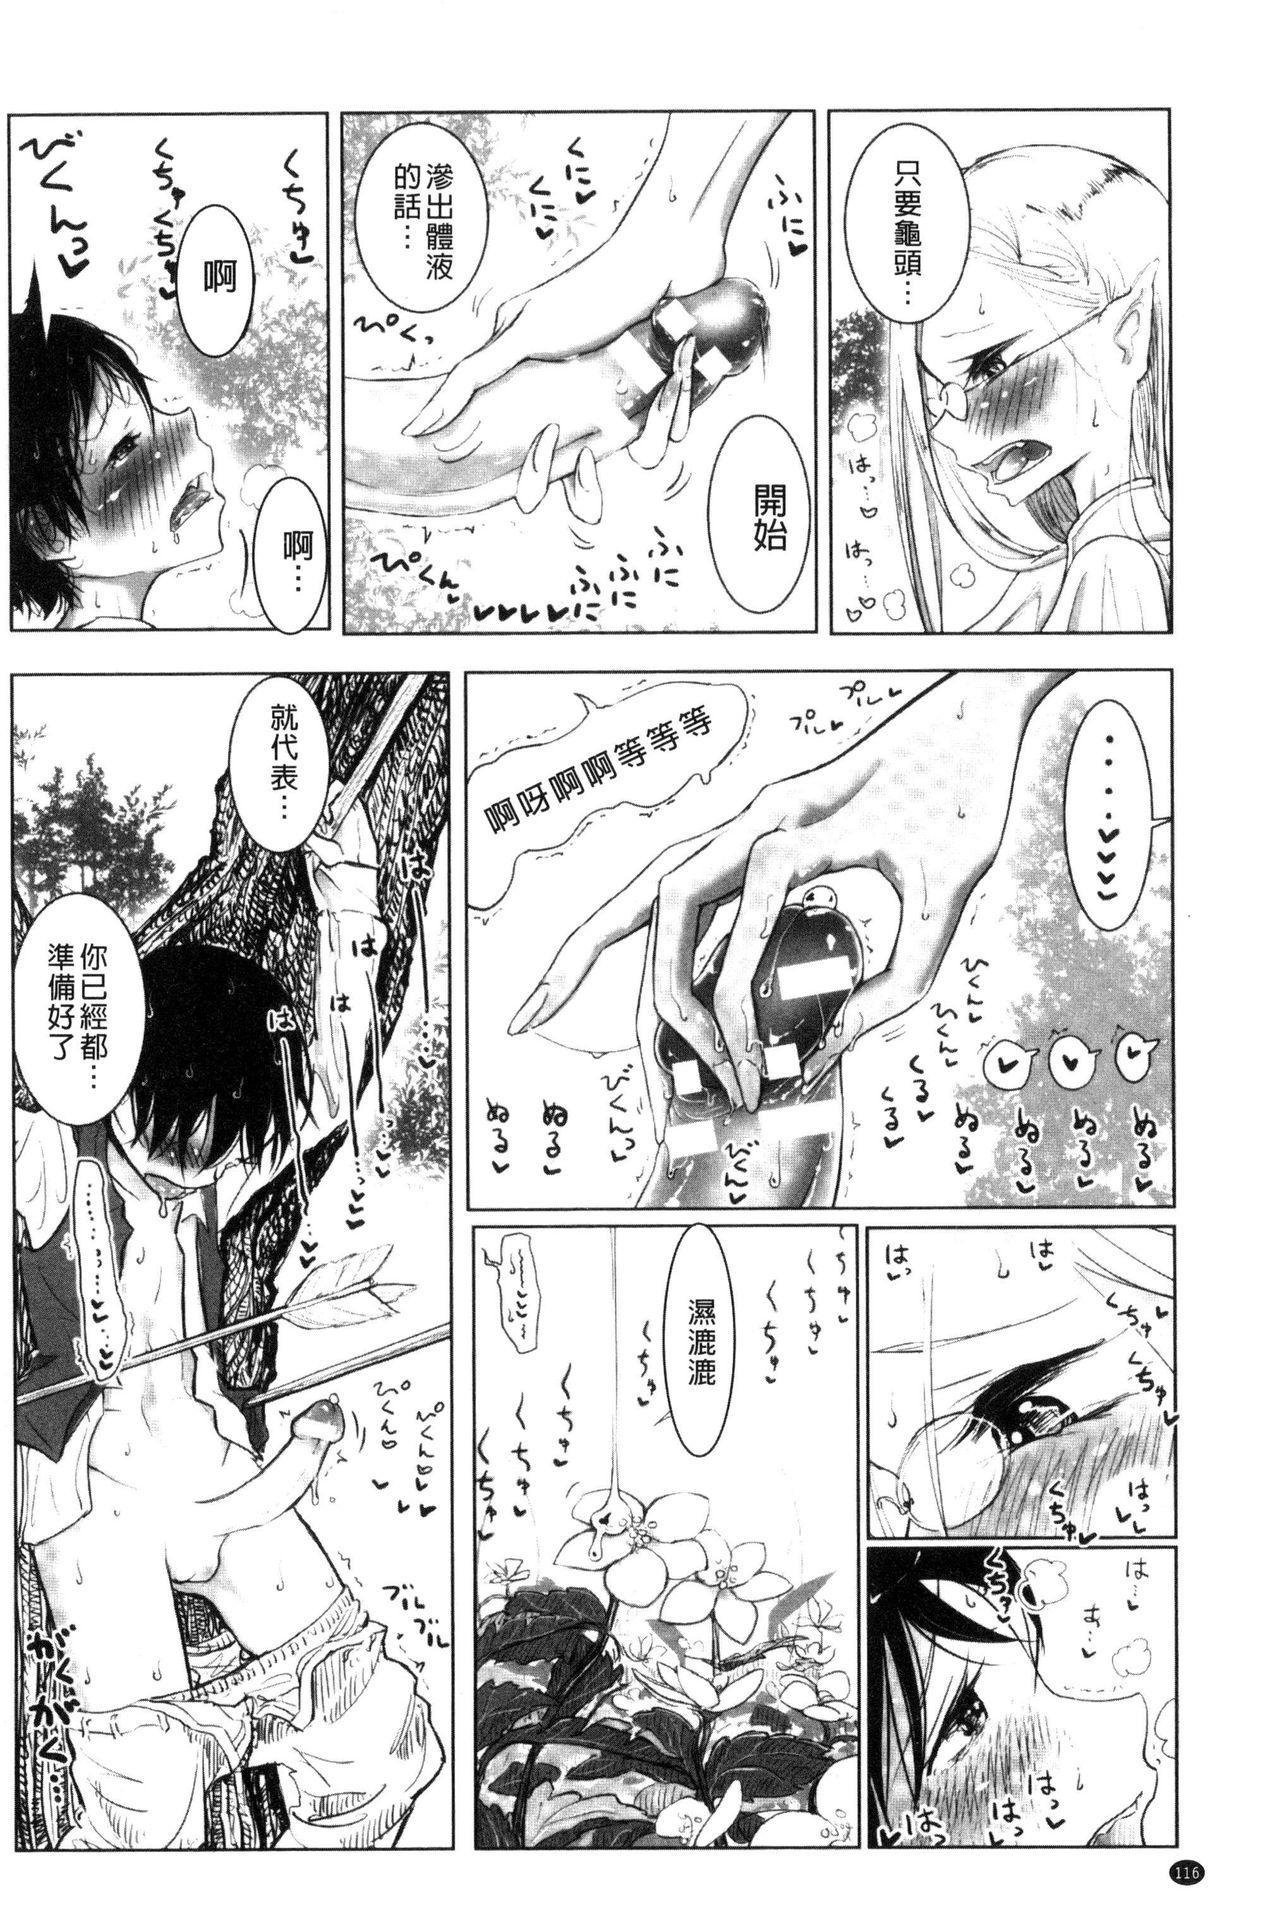 [Dhibi] Sono Yubisaki de Korogashite - Please Caress it at the Finger-tip. [Chinese] 117